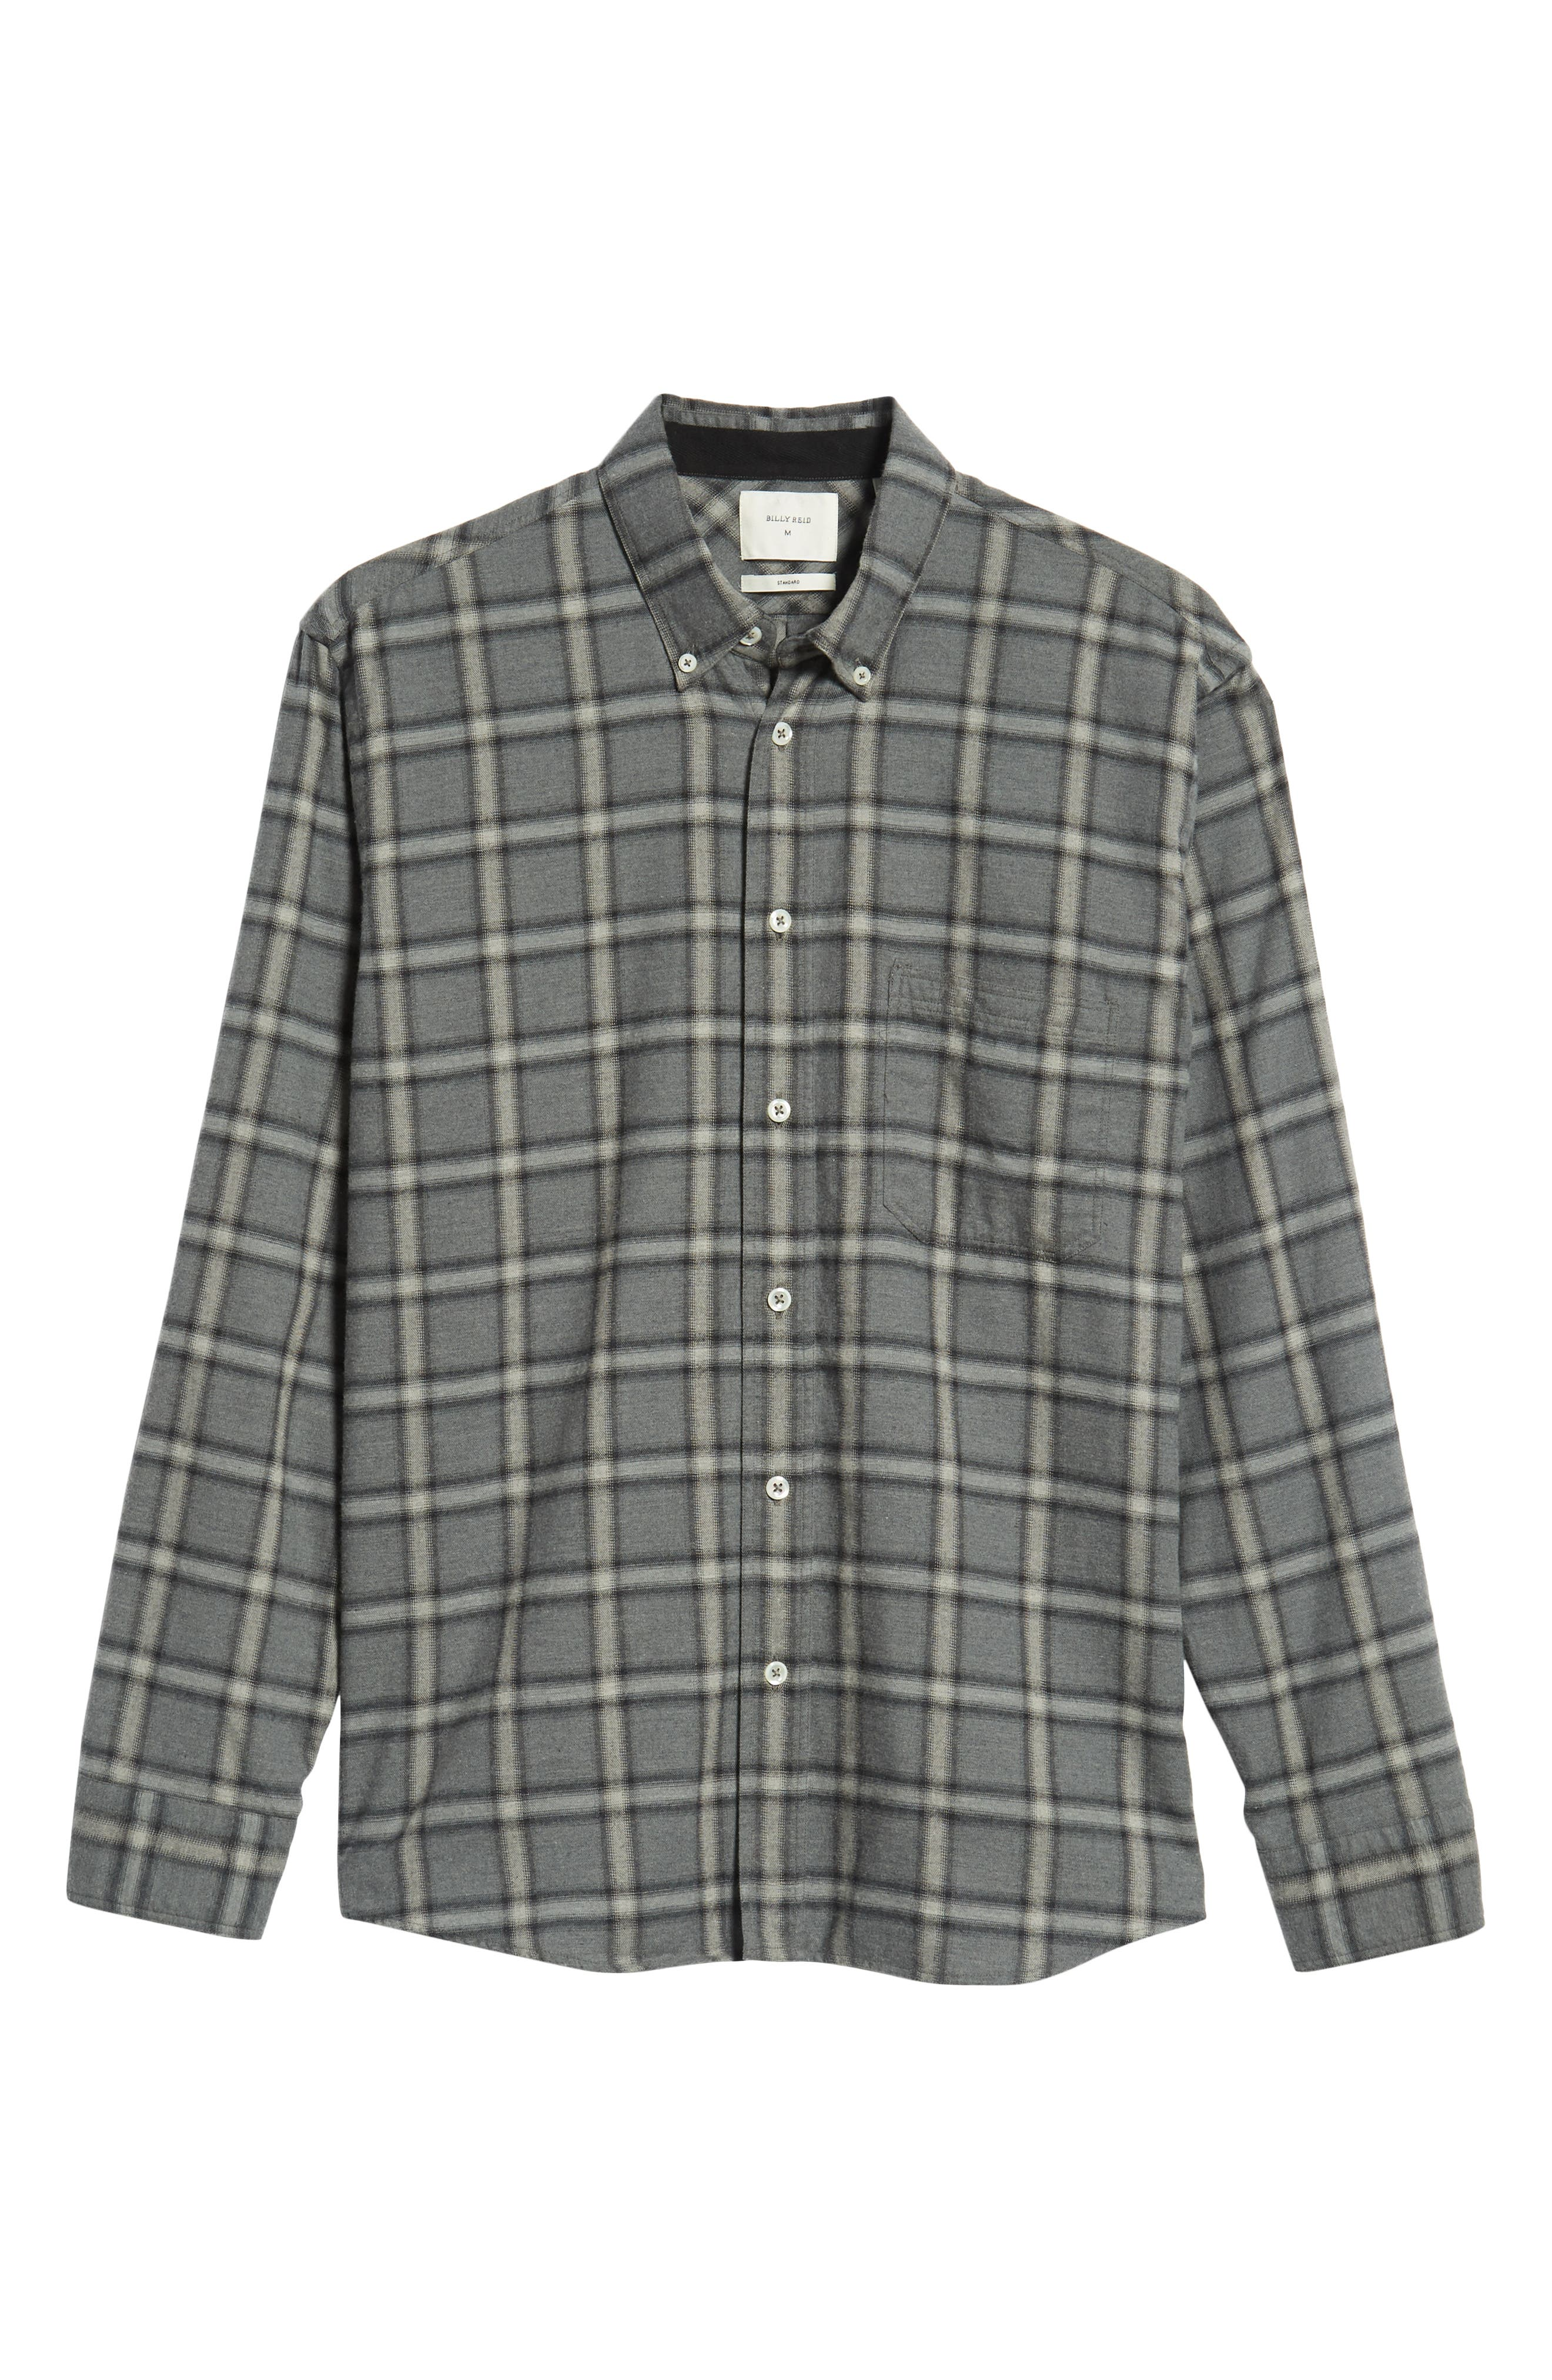 Tuscumbia Regular Fit Plaid Sport Shirt,                             Alternate thumbnail 5, color,                             BLUE/ GREY